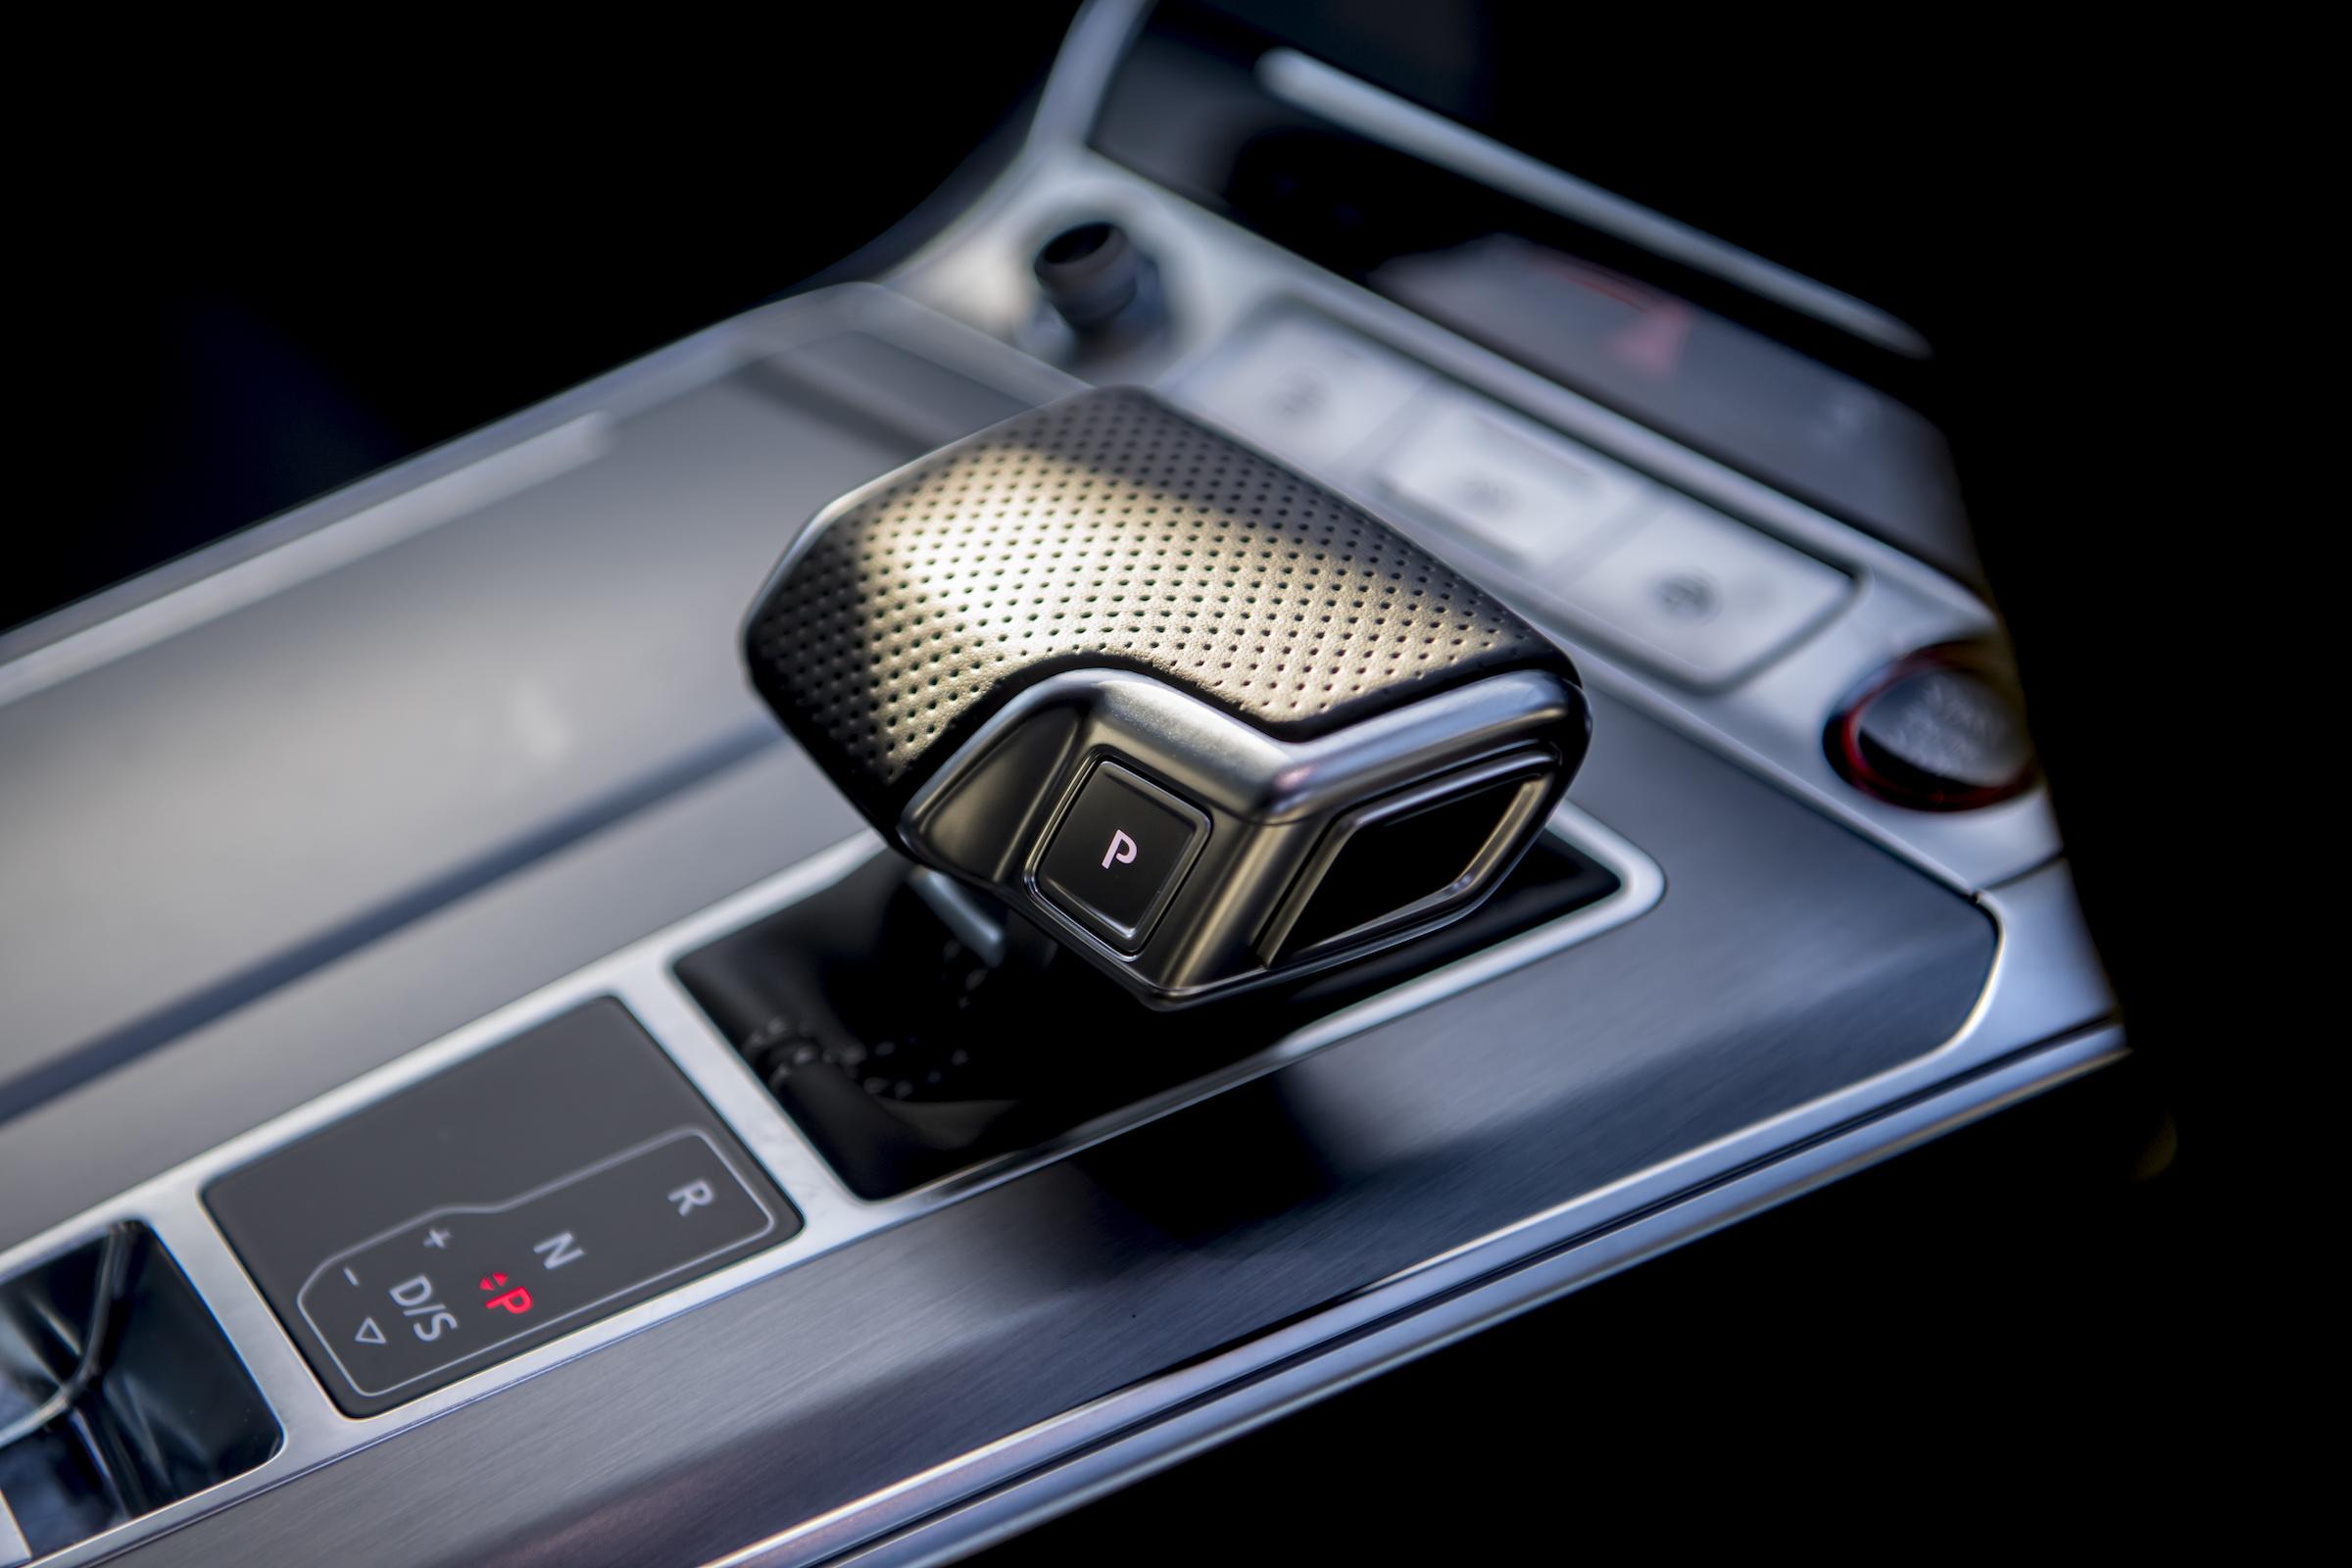 Audi RS6 interior shifter knob detail